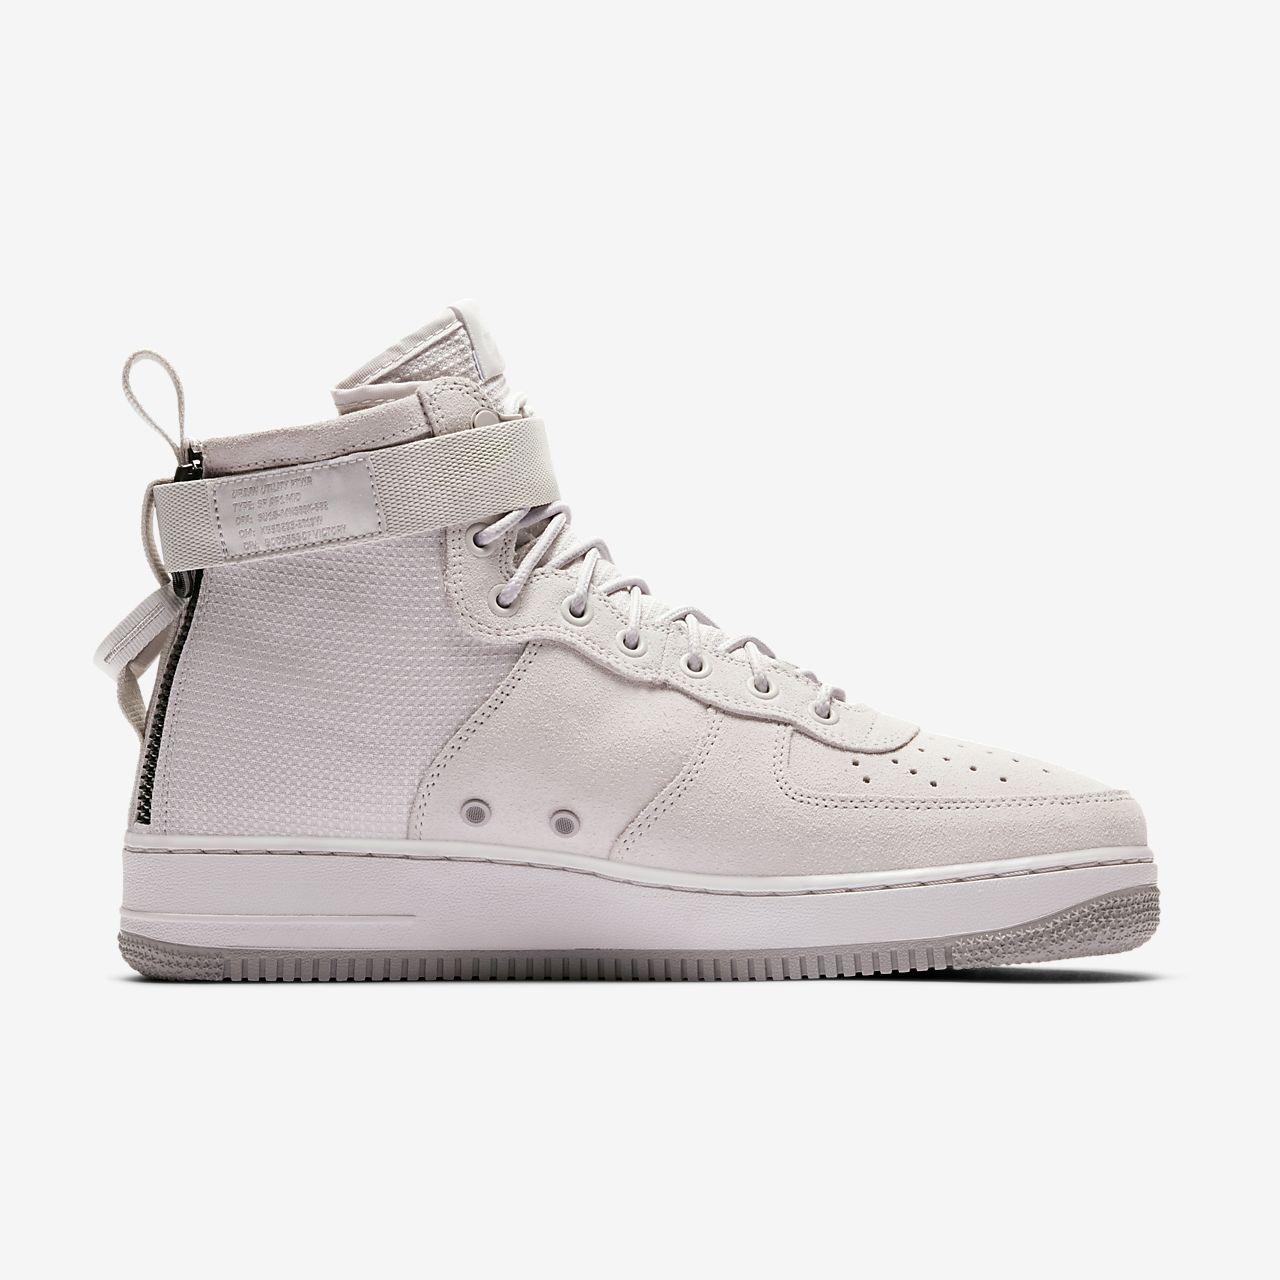 Sf Nike Air Force Chaussures En Daim Gris Moyen SYvEYpDY